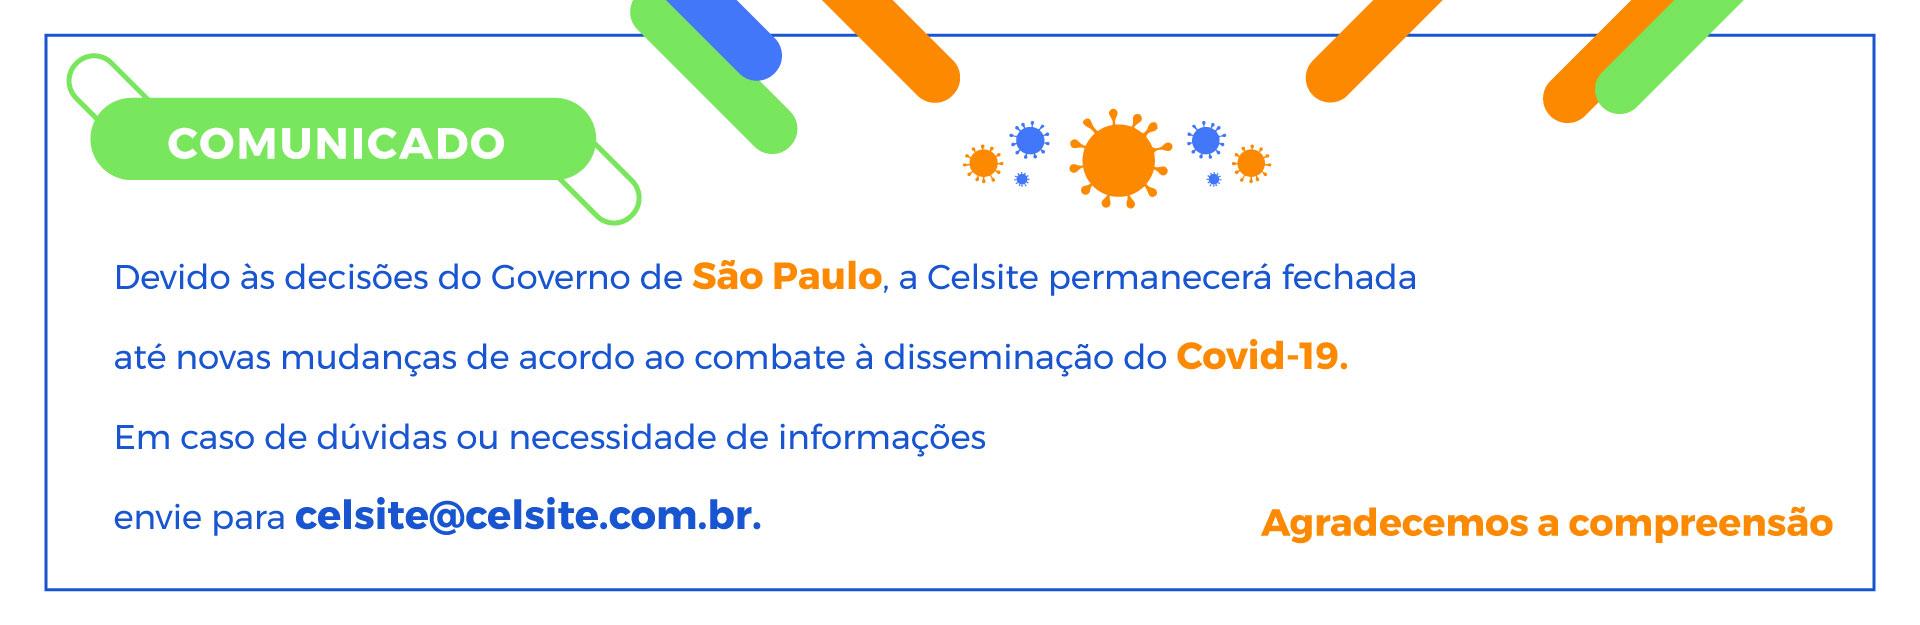 banner-aviso-corona-virus.ai-1